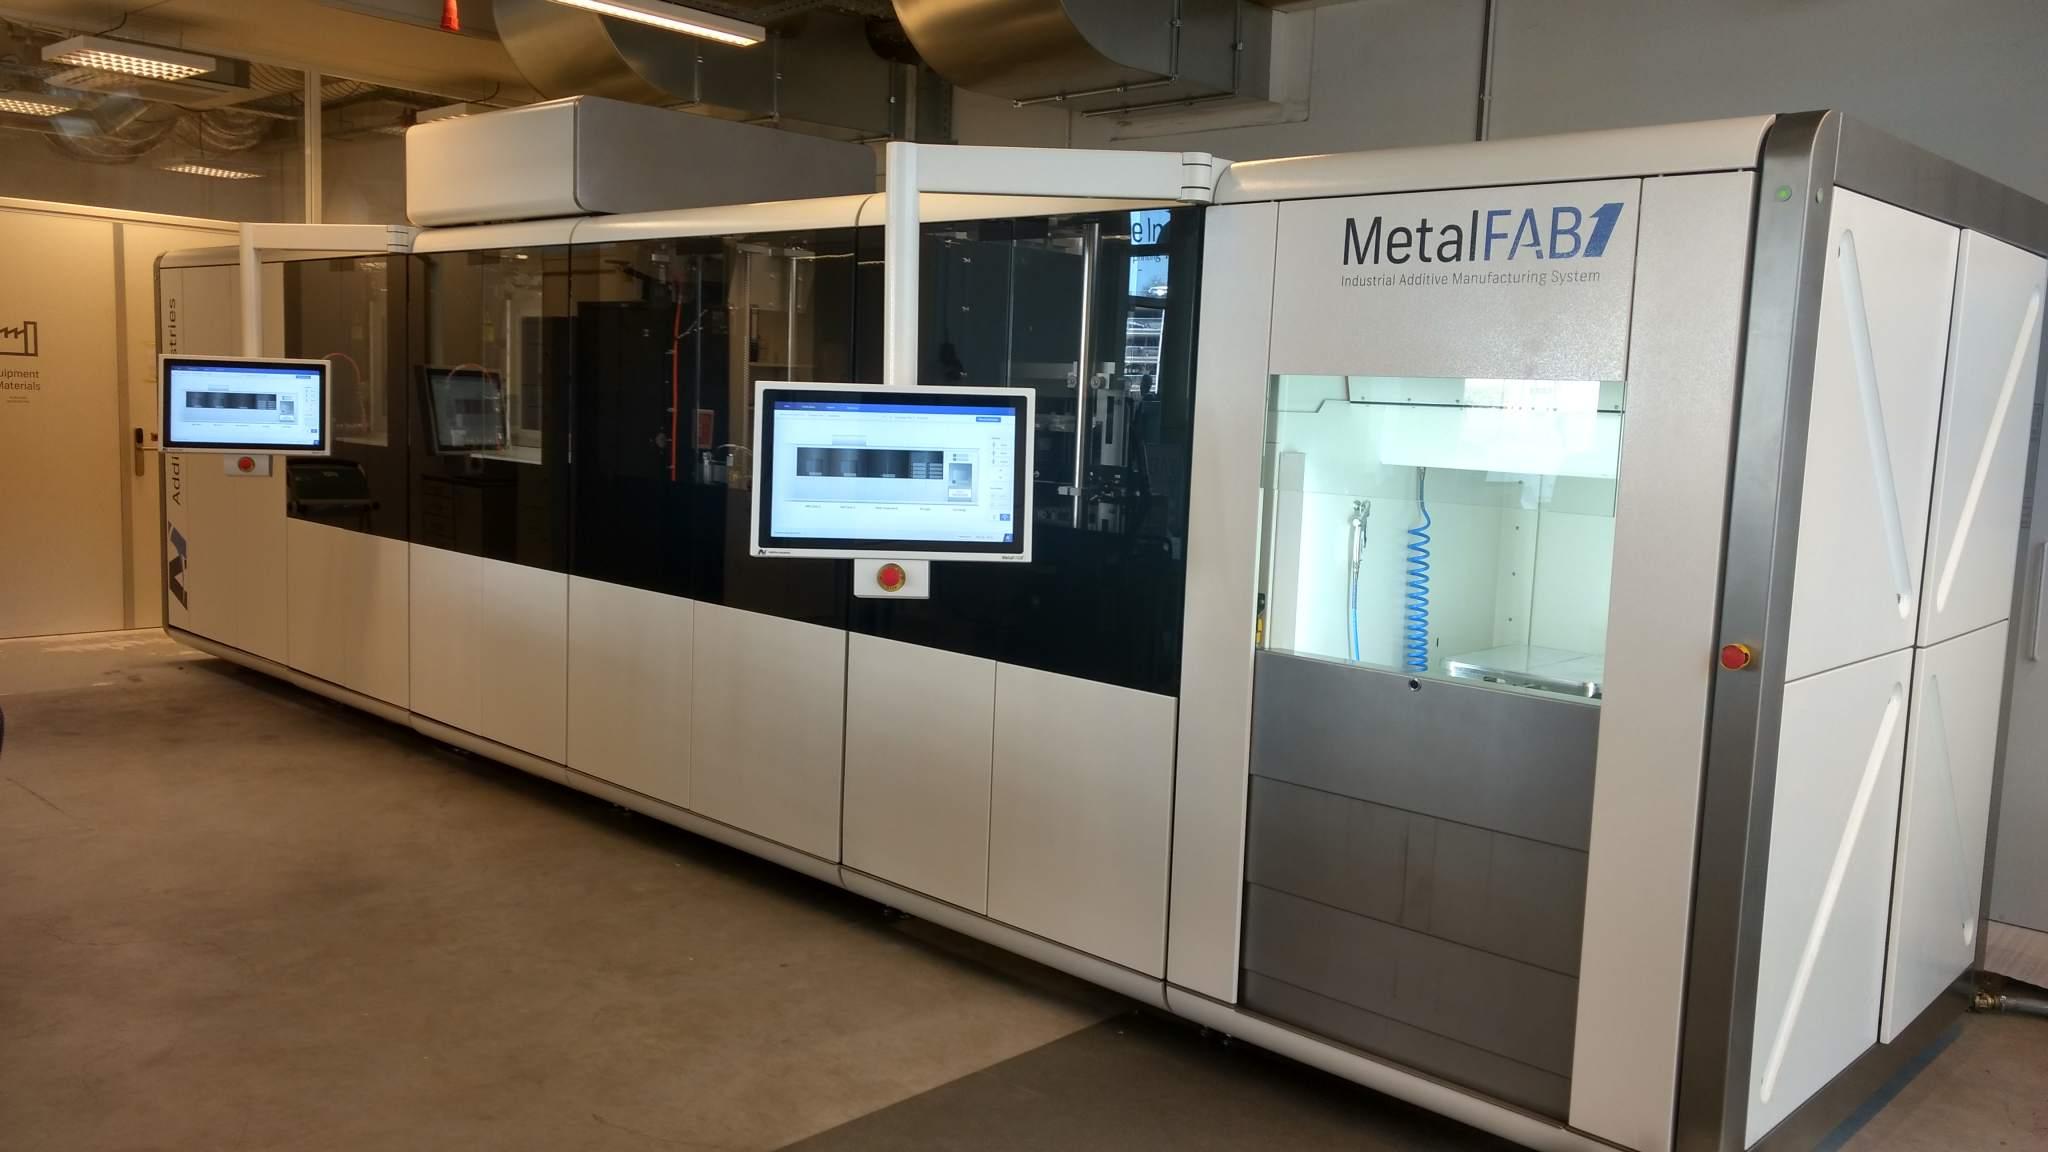 The MetalFAB1 machine at Additive Industries HQ. Photo by Corey Clarke.